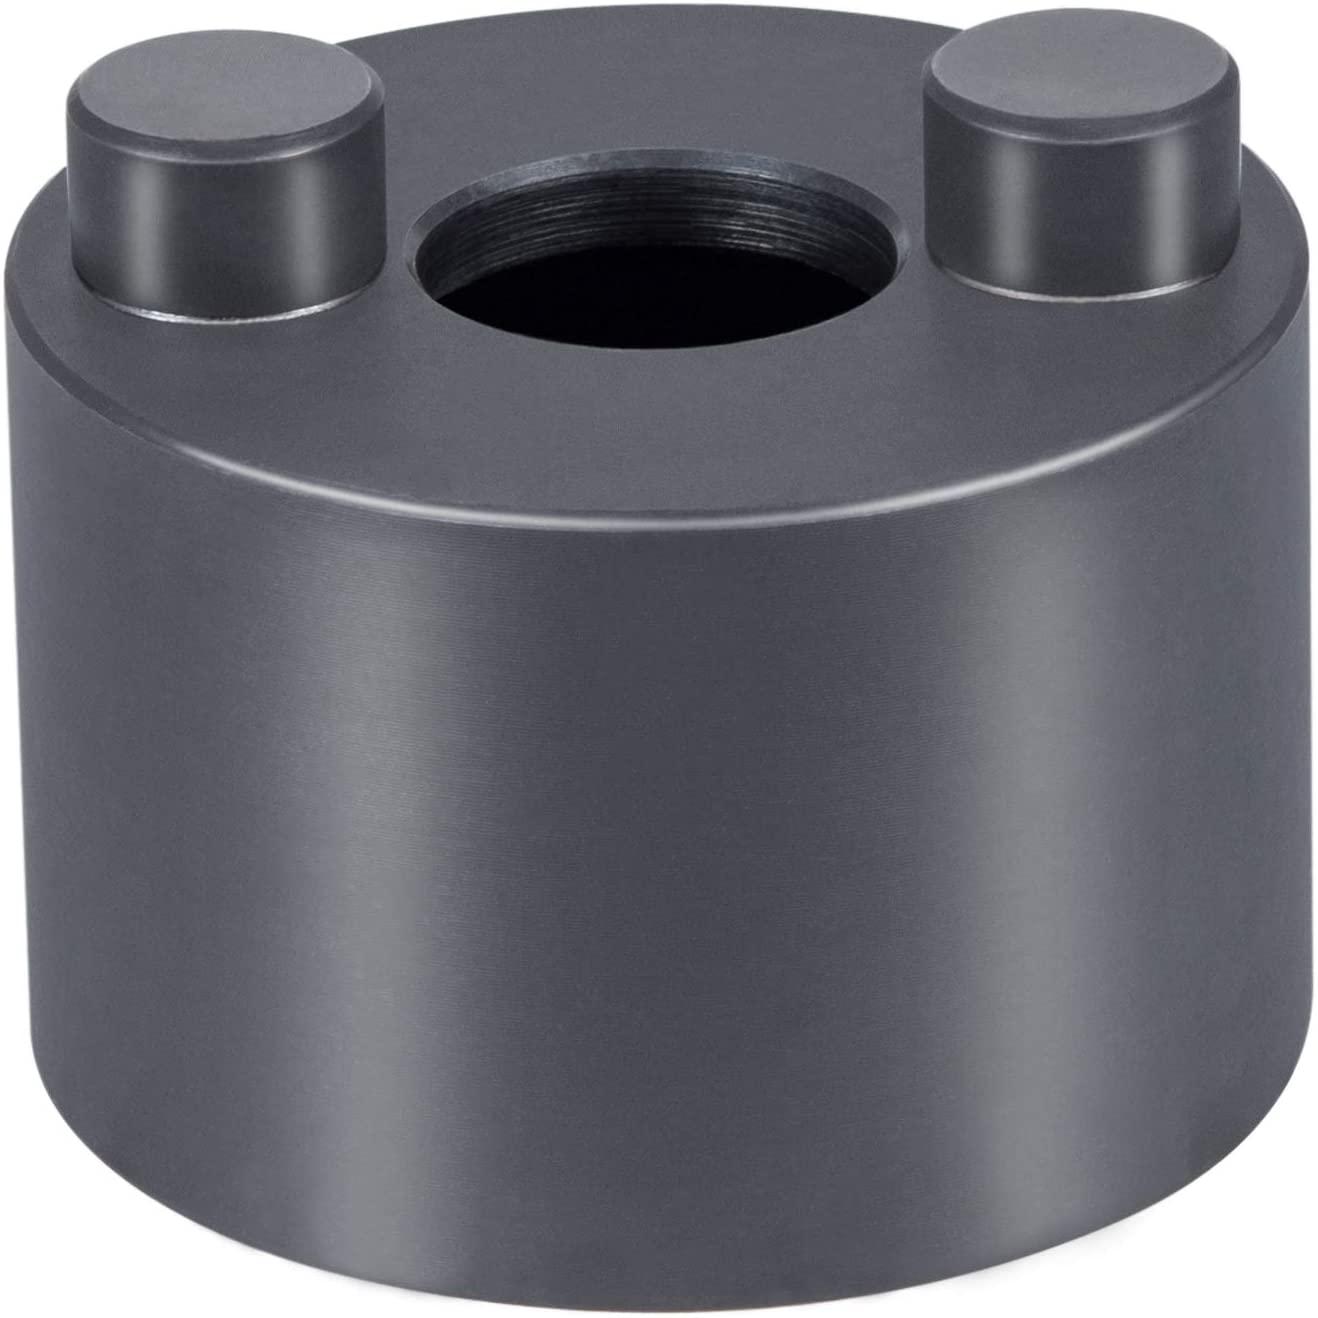 E-cowlboy for Volvo Truck & Mack Leaf Spring and Shackle Pin Remover/Installer Socket Alt to OEM 9996791 and TG15103